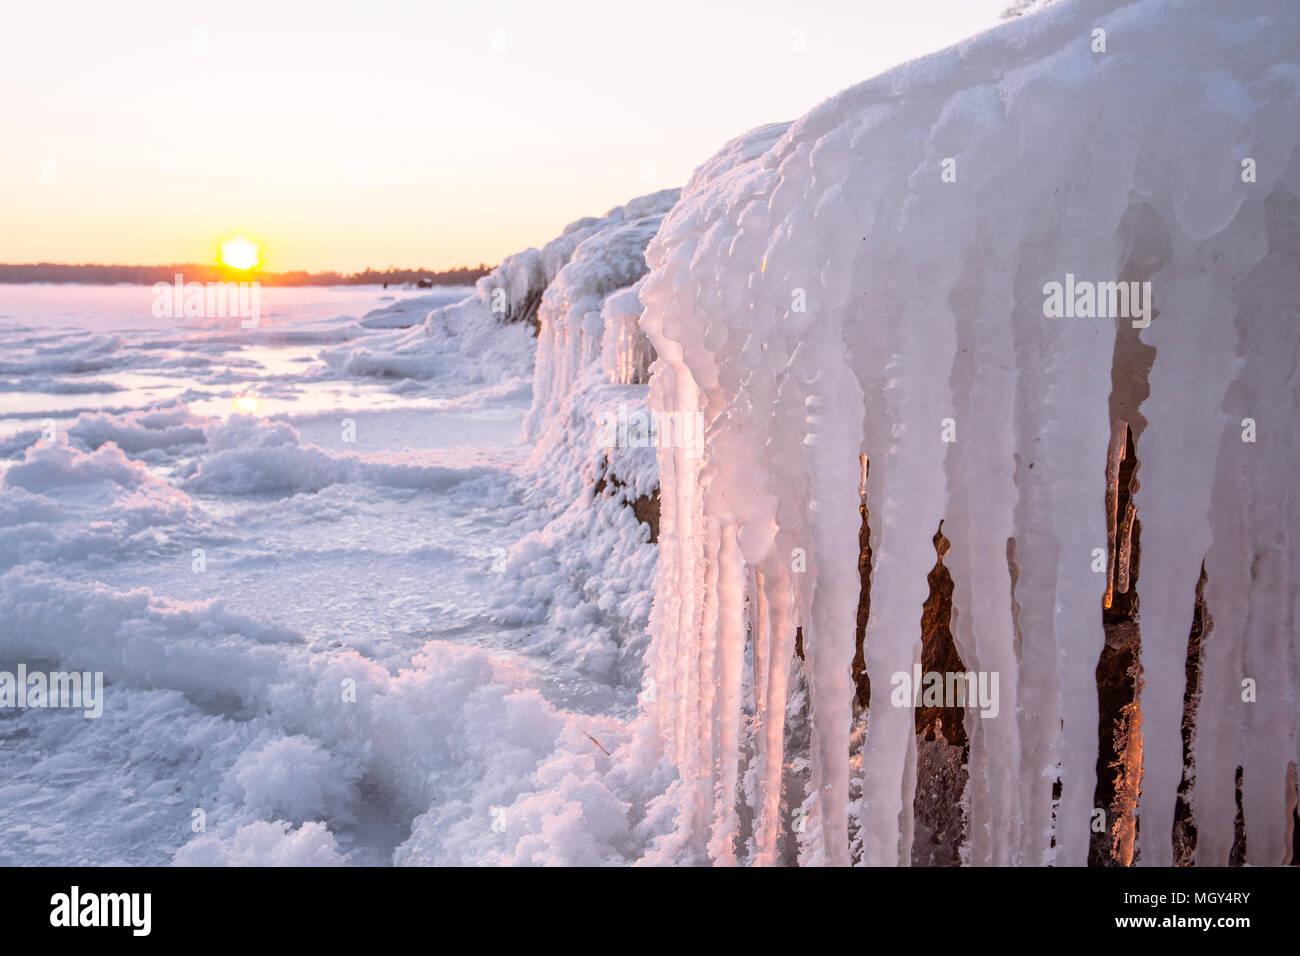 Frozen Baltic sea from Koirien uimaranta,Toppelunde,Espoo,Finland,Europe - Stock Image